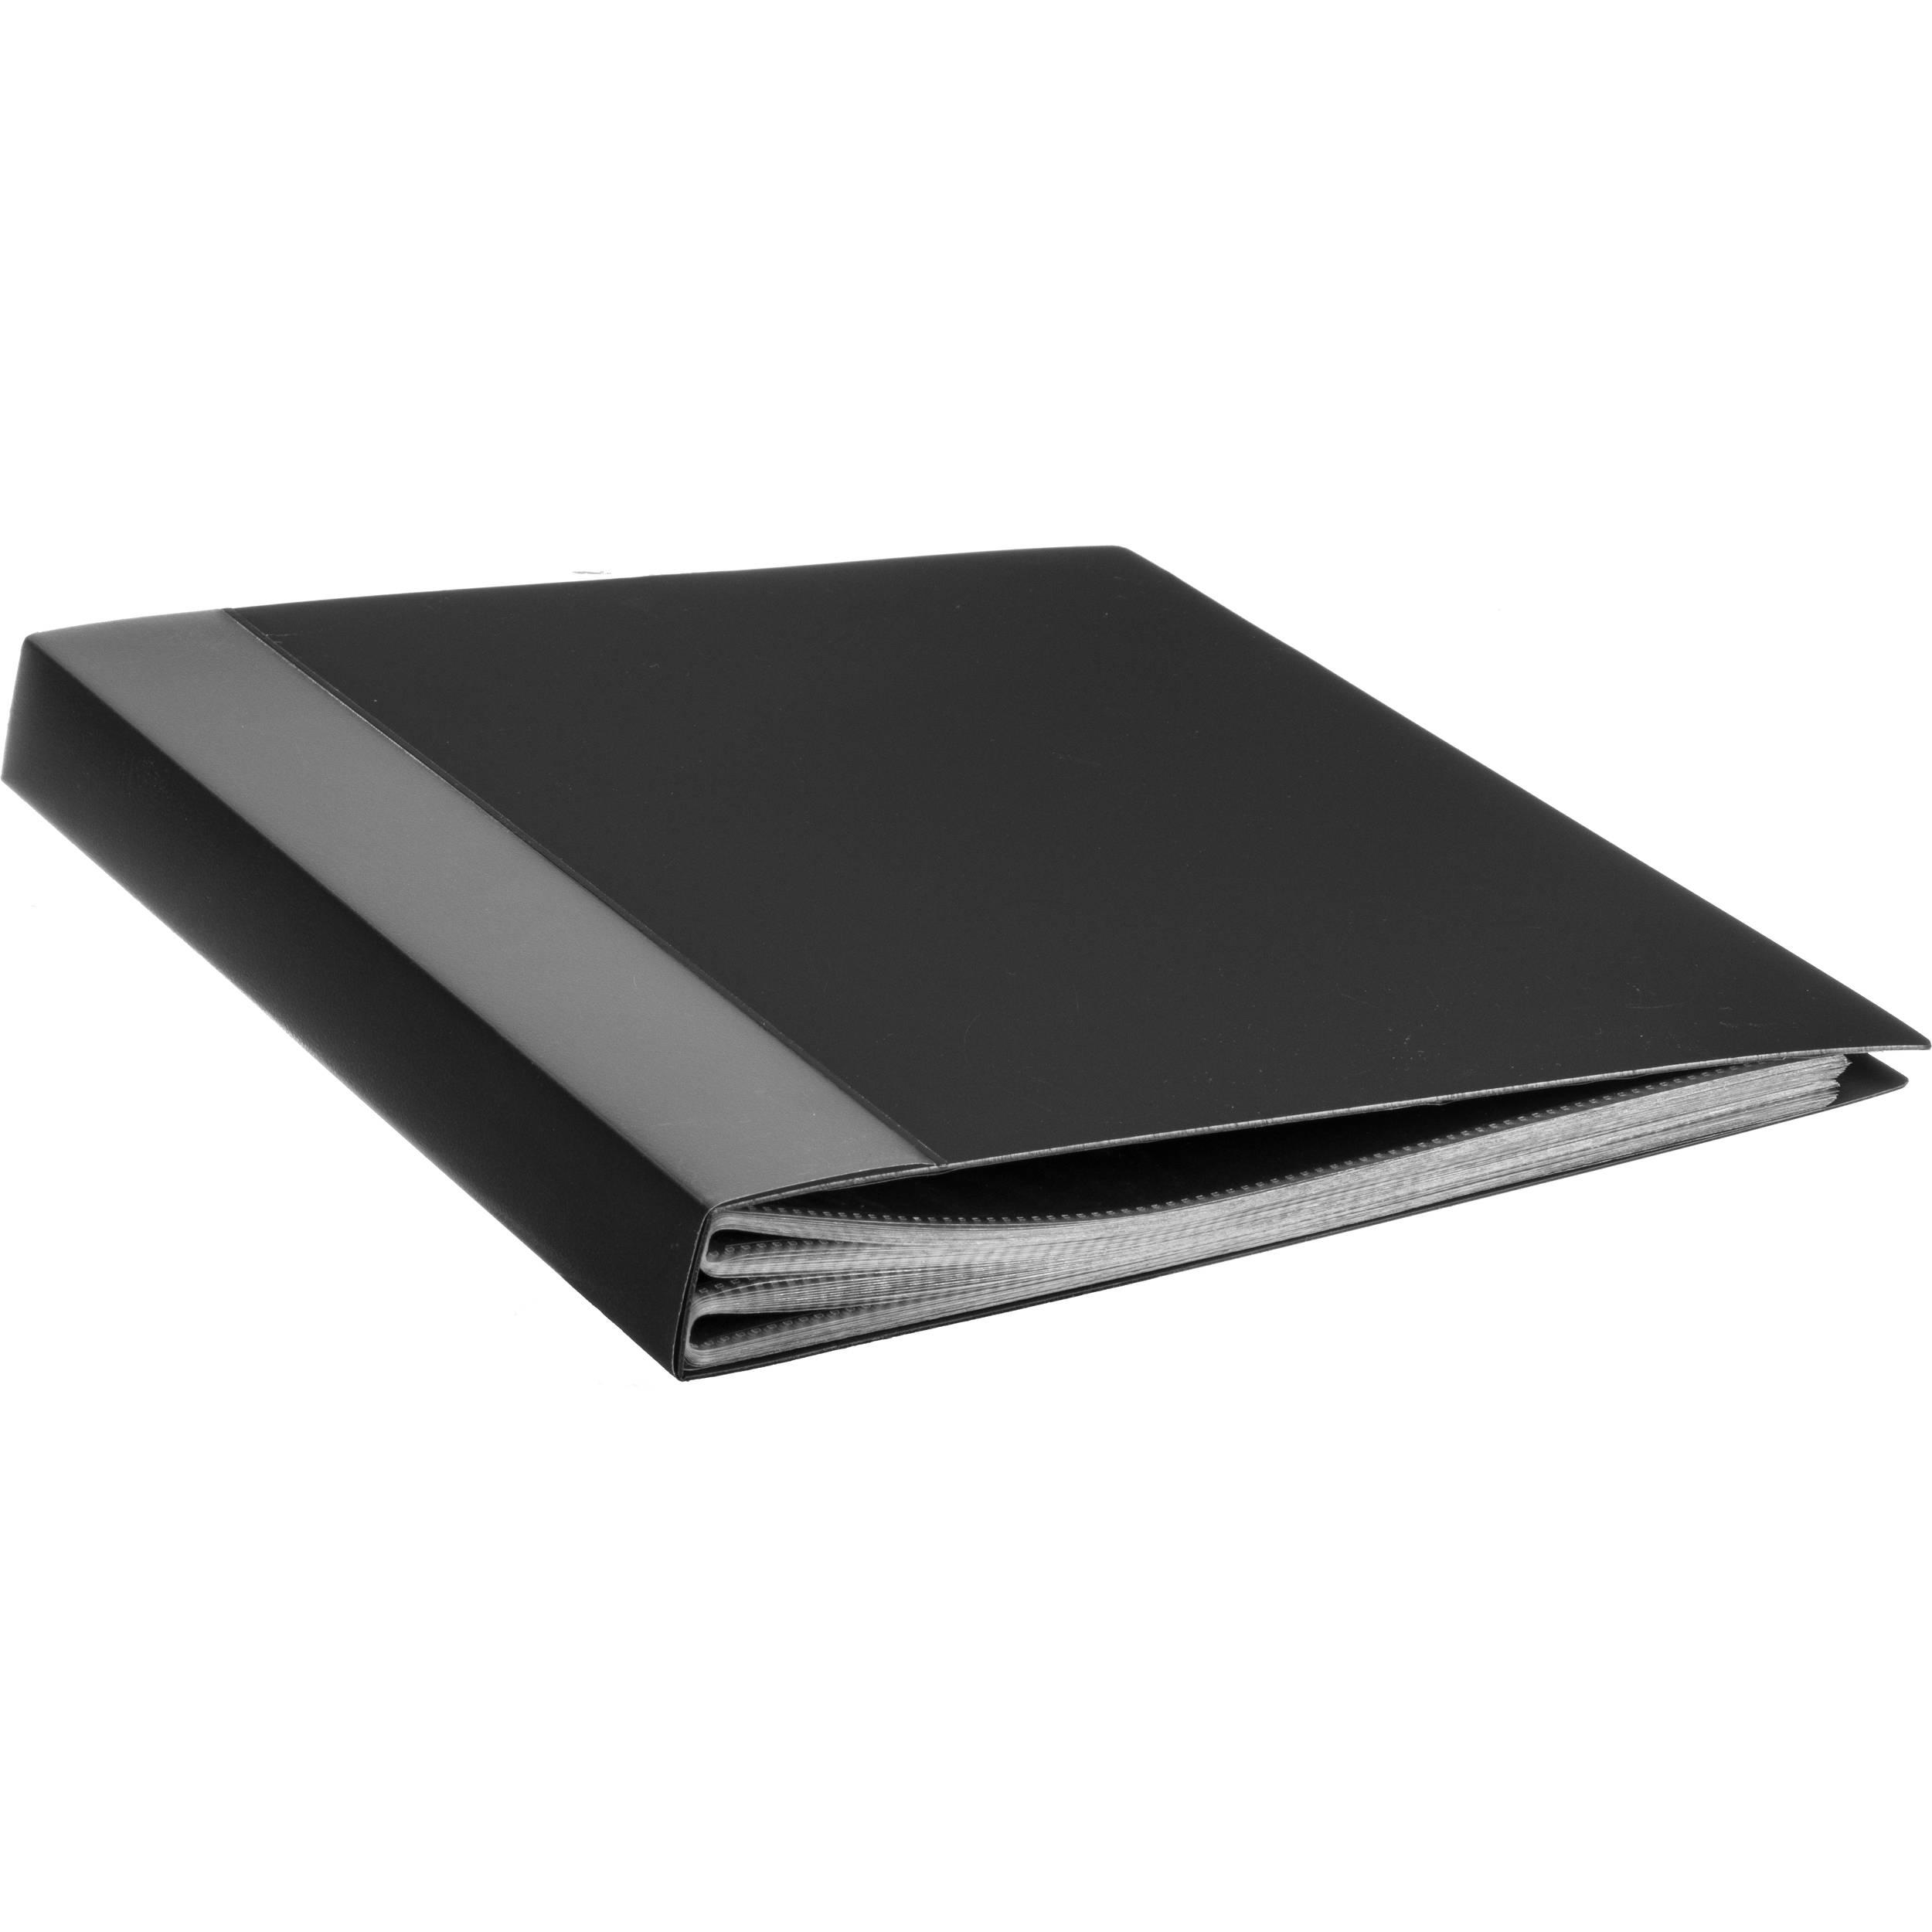 Book Cover Art Zip Code : Itoya art profolio original storage display book ia